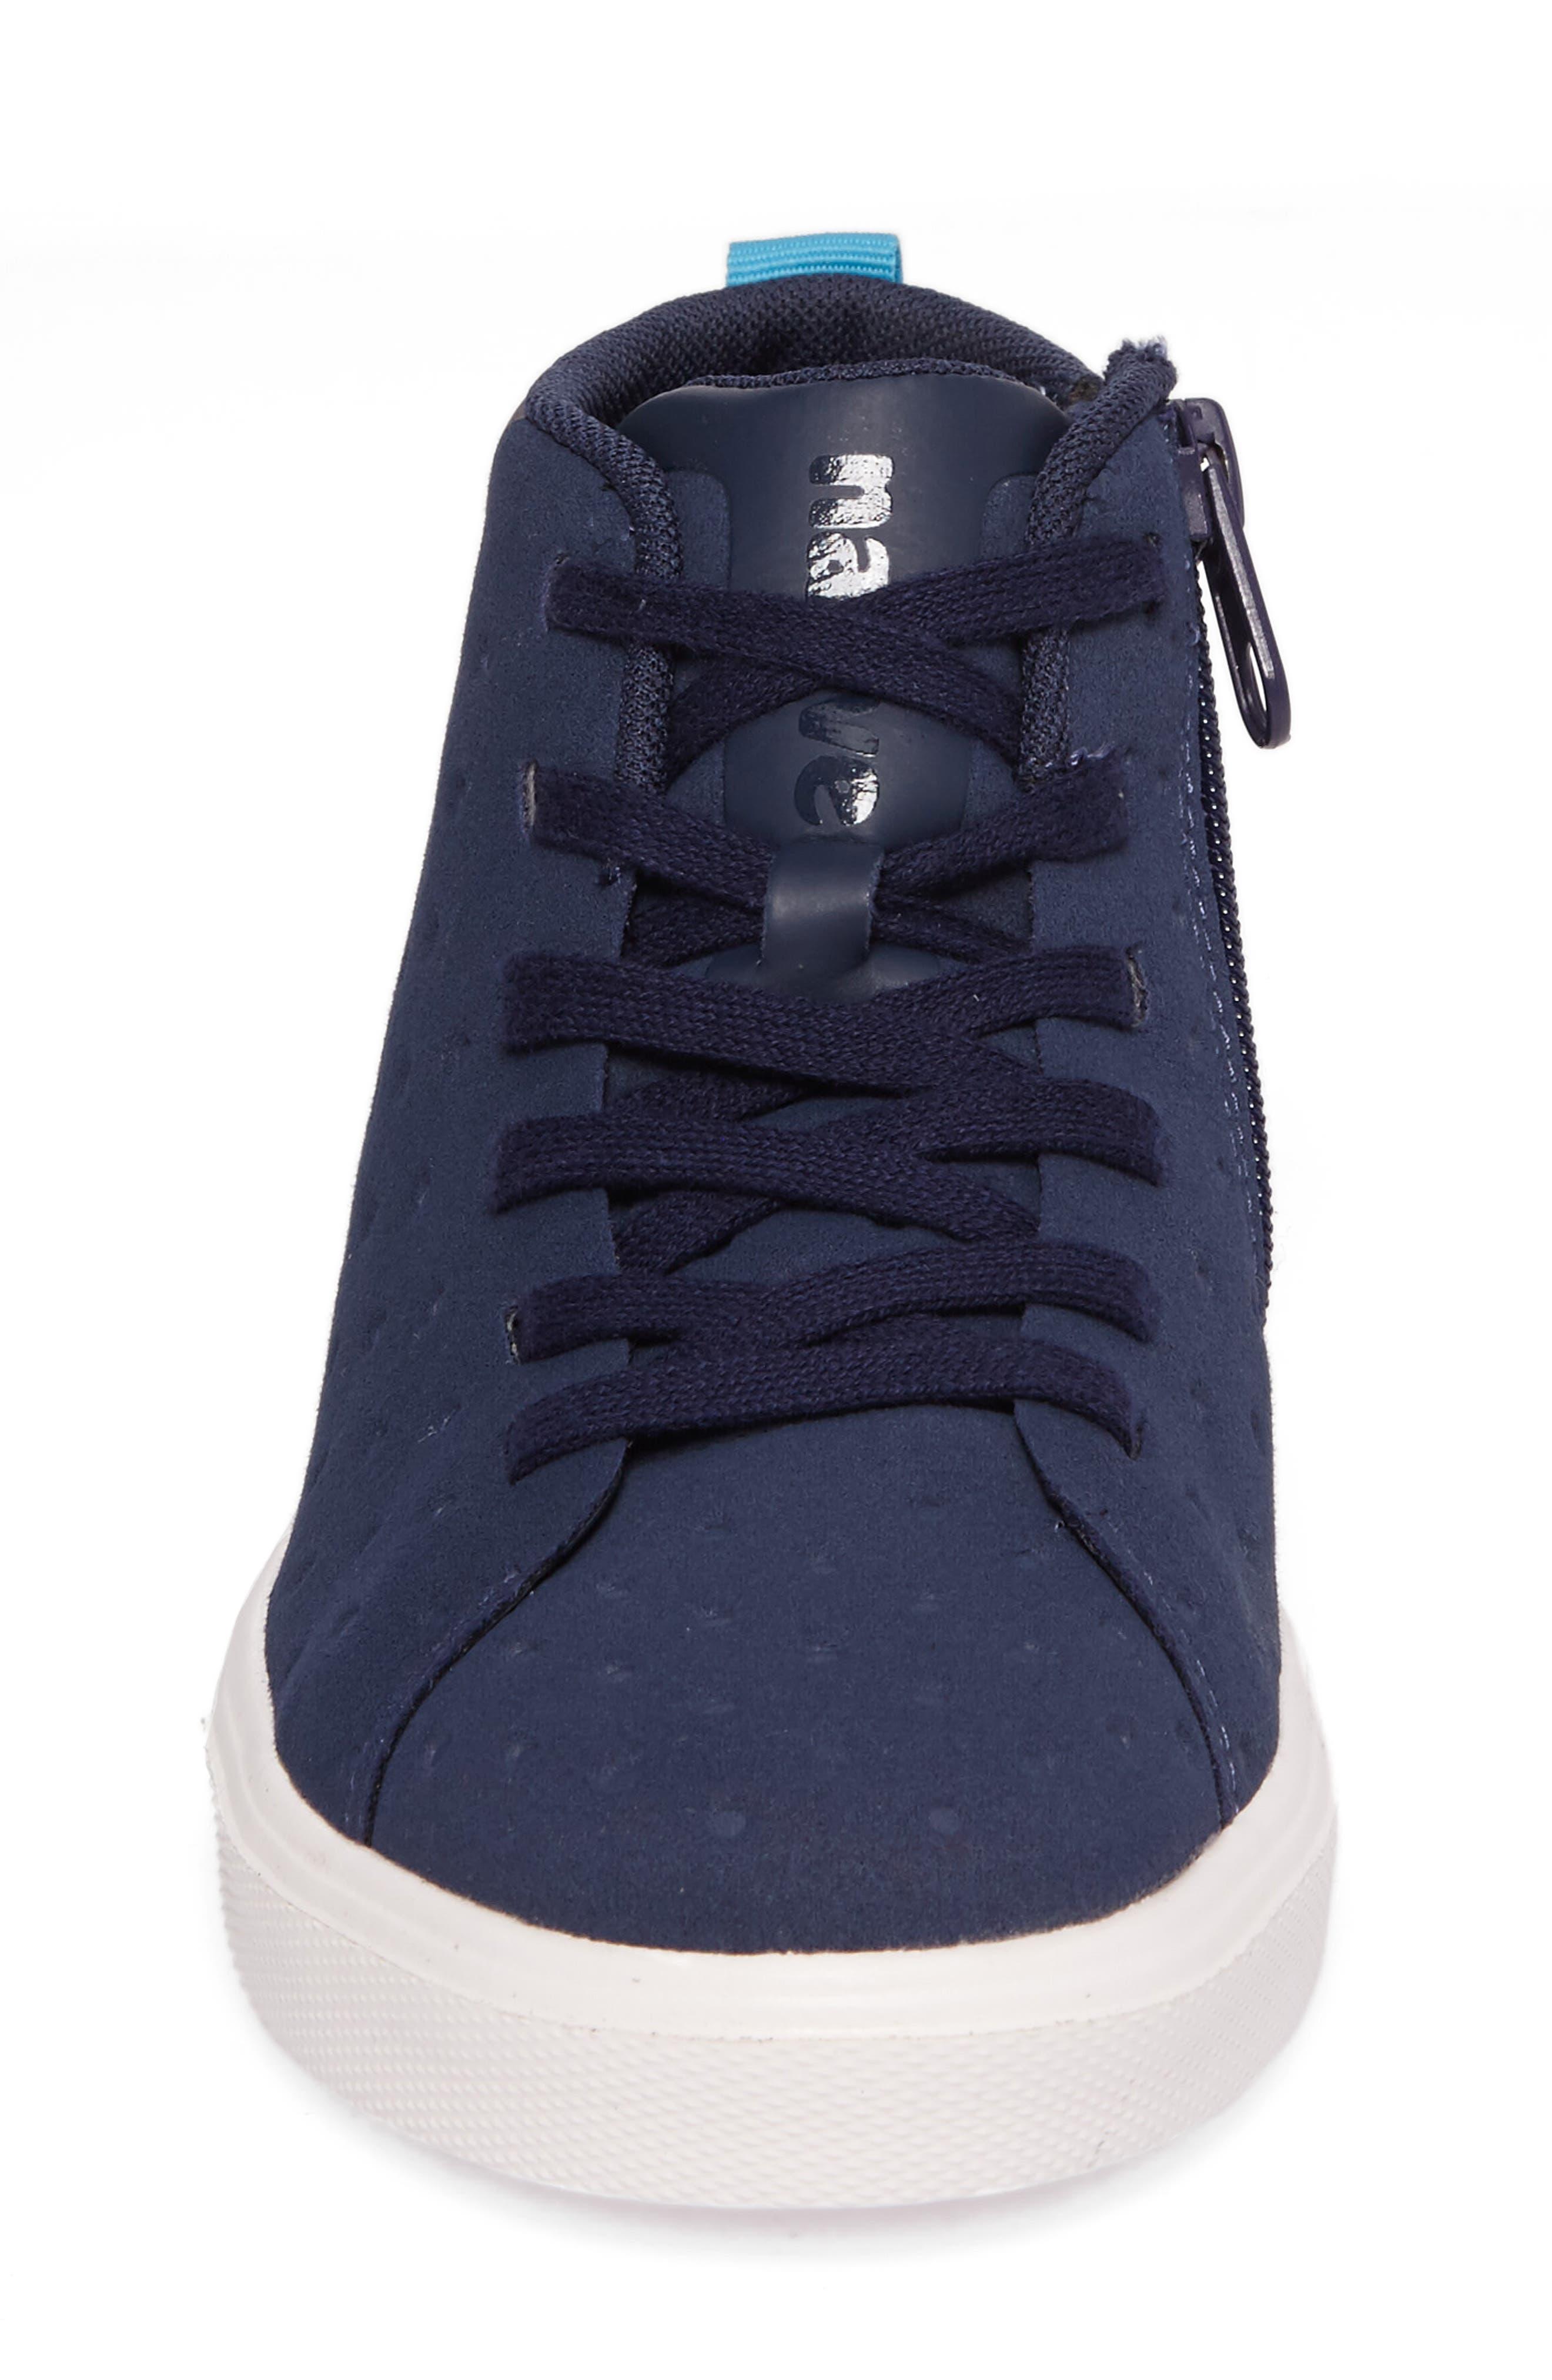 Native Monaco Sneaker,                             Alternate thumbnail 4, color,                             Regatta Blue/ Shell White